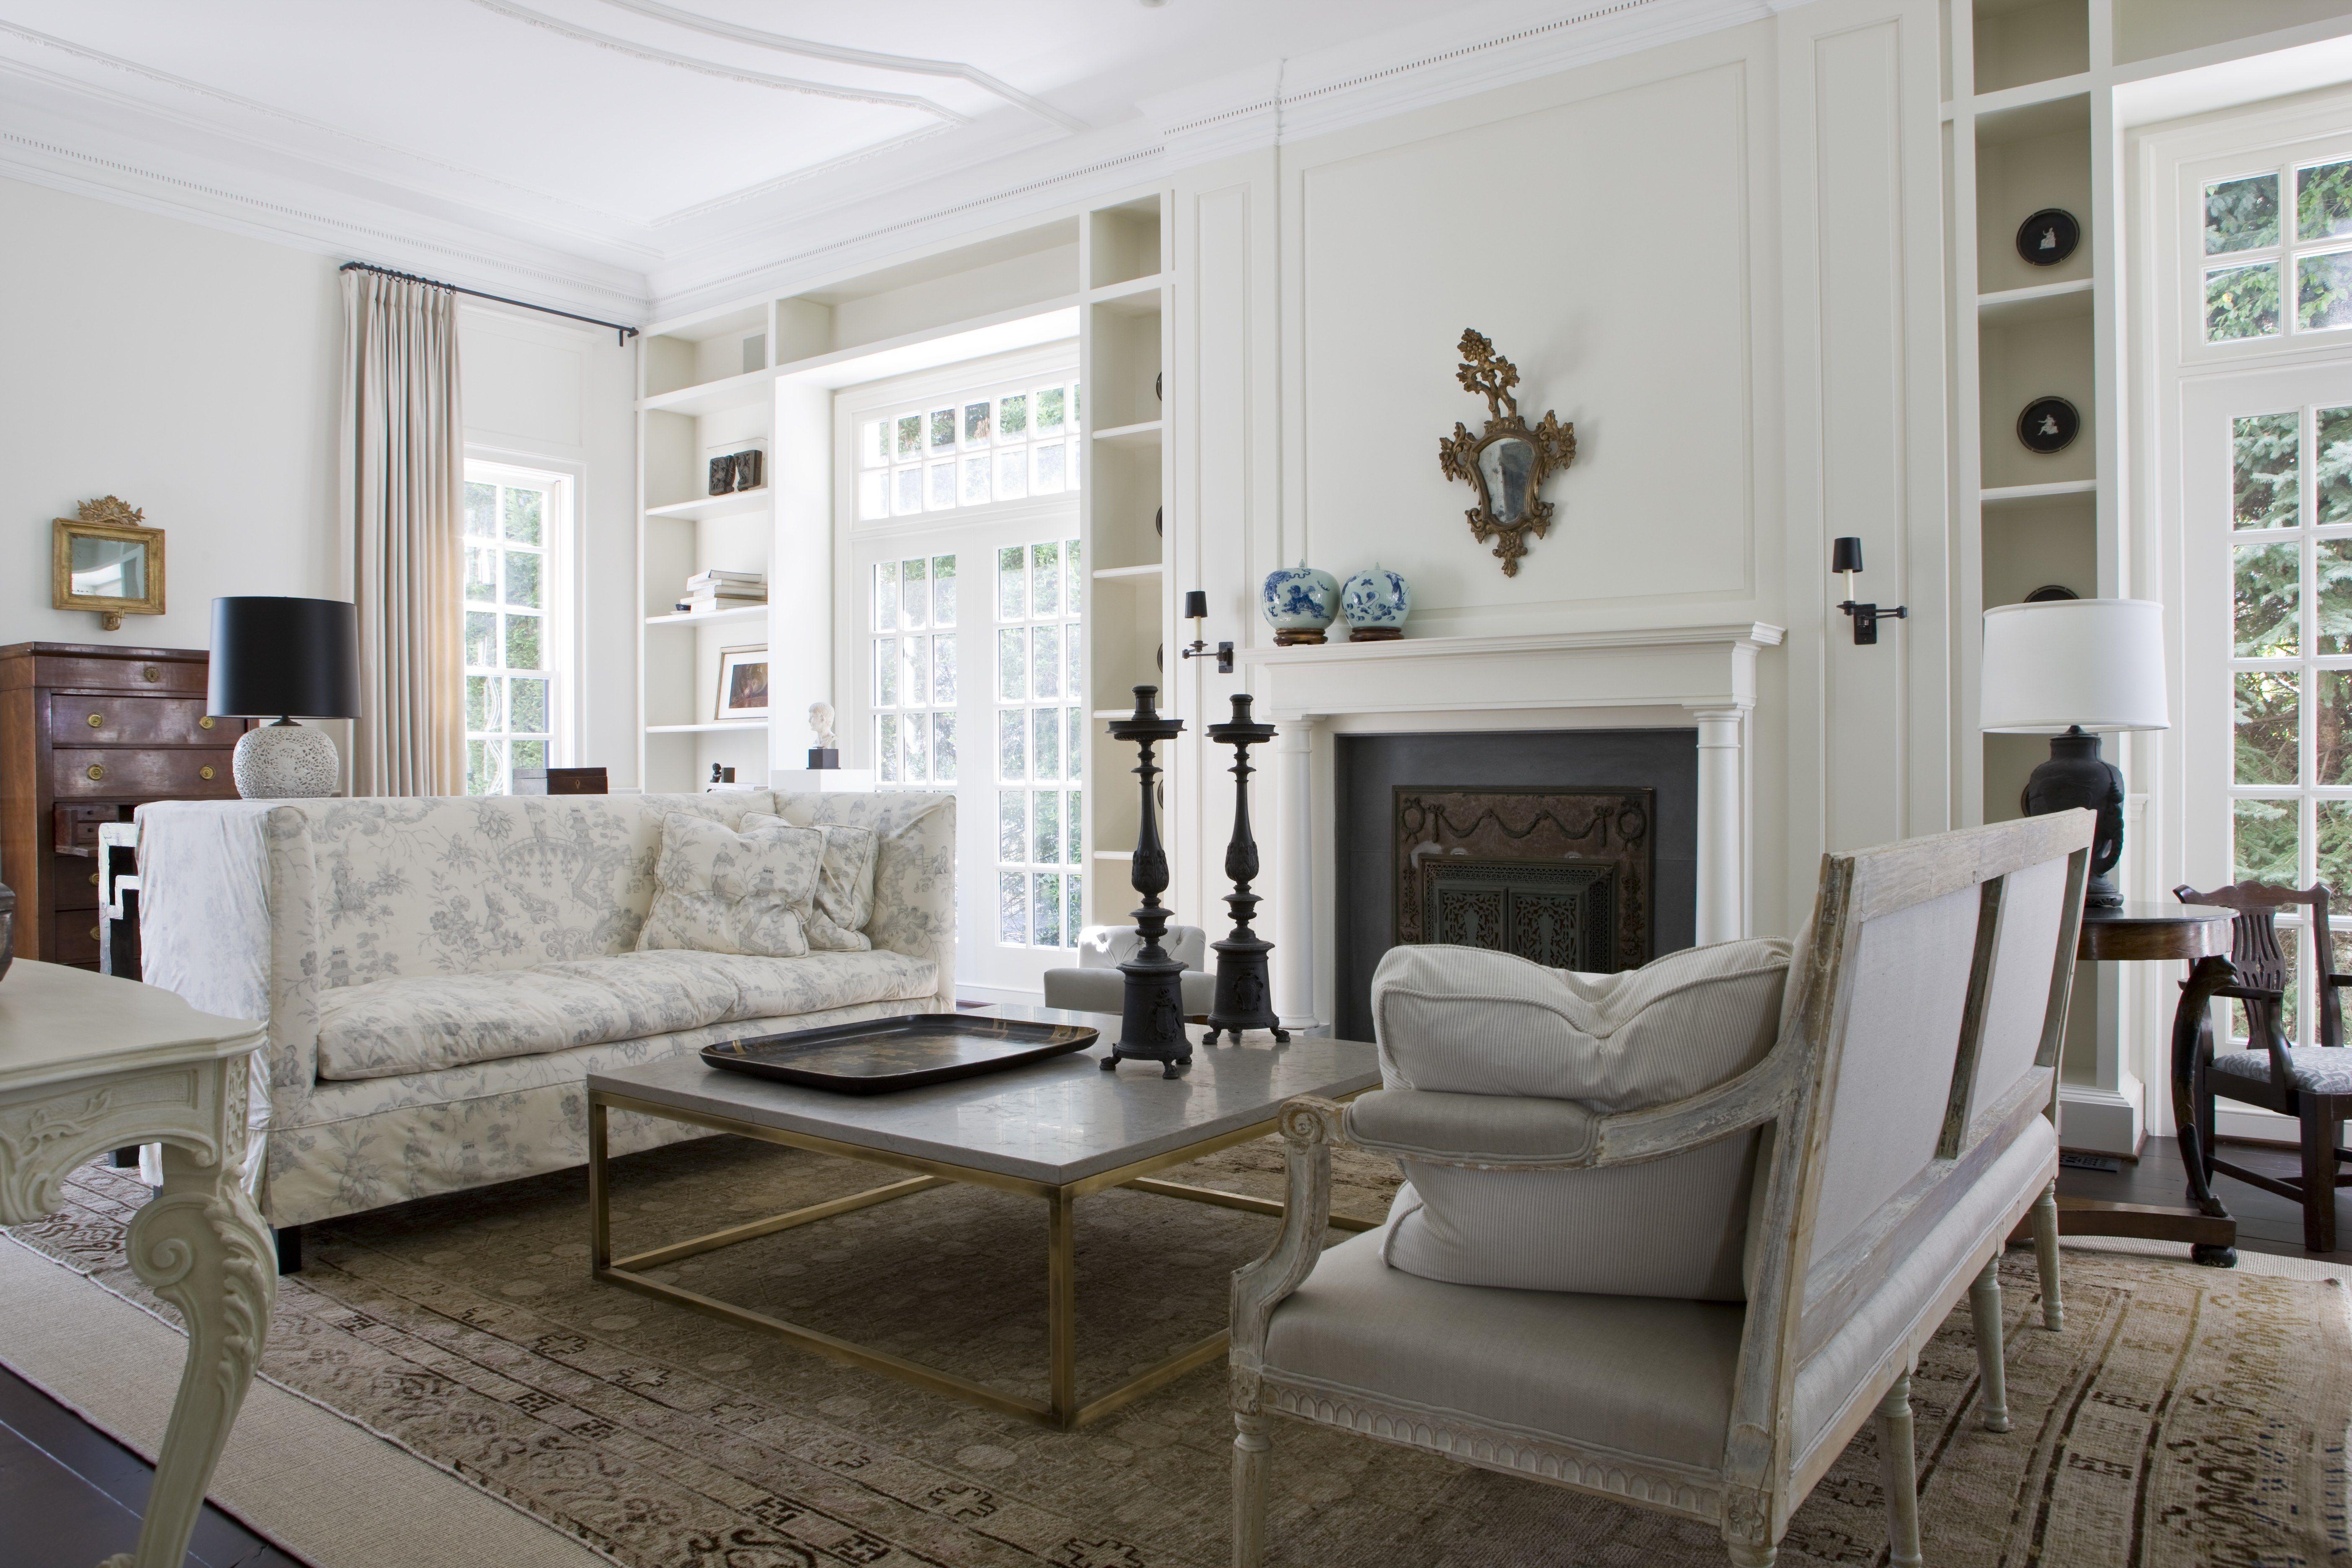 Superb Carter Home Designs #5: Dual Occupancy Home Designs U0026 .